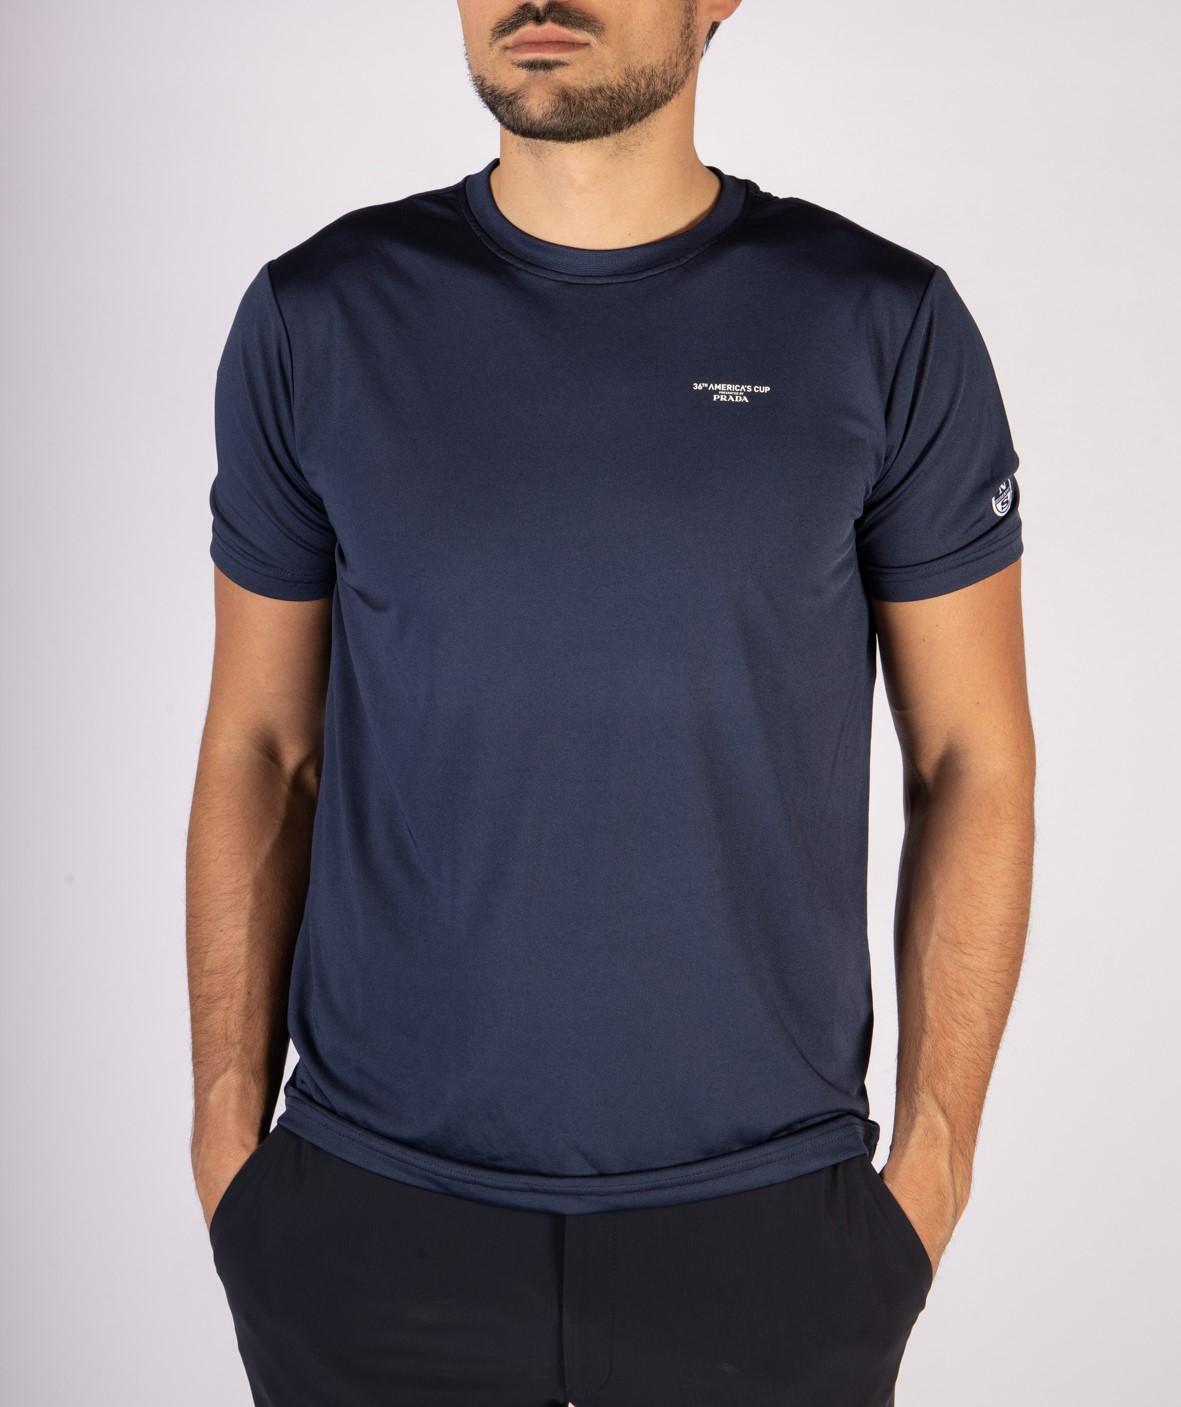 T-SHIRT AMERICA'S CUP NORTH SAILS | T-shirt | 4523070802